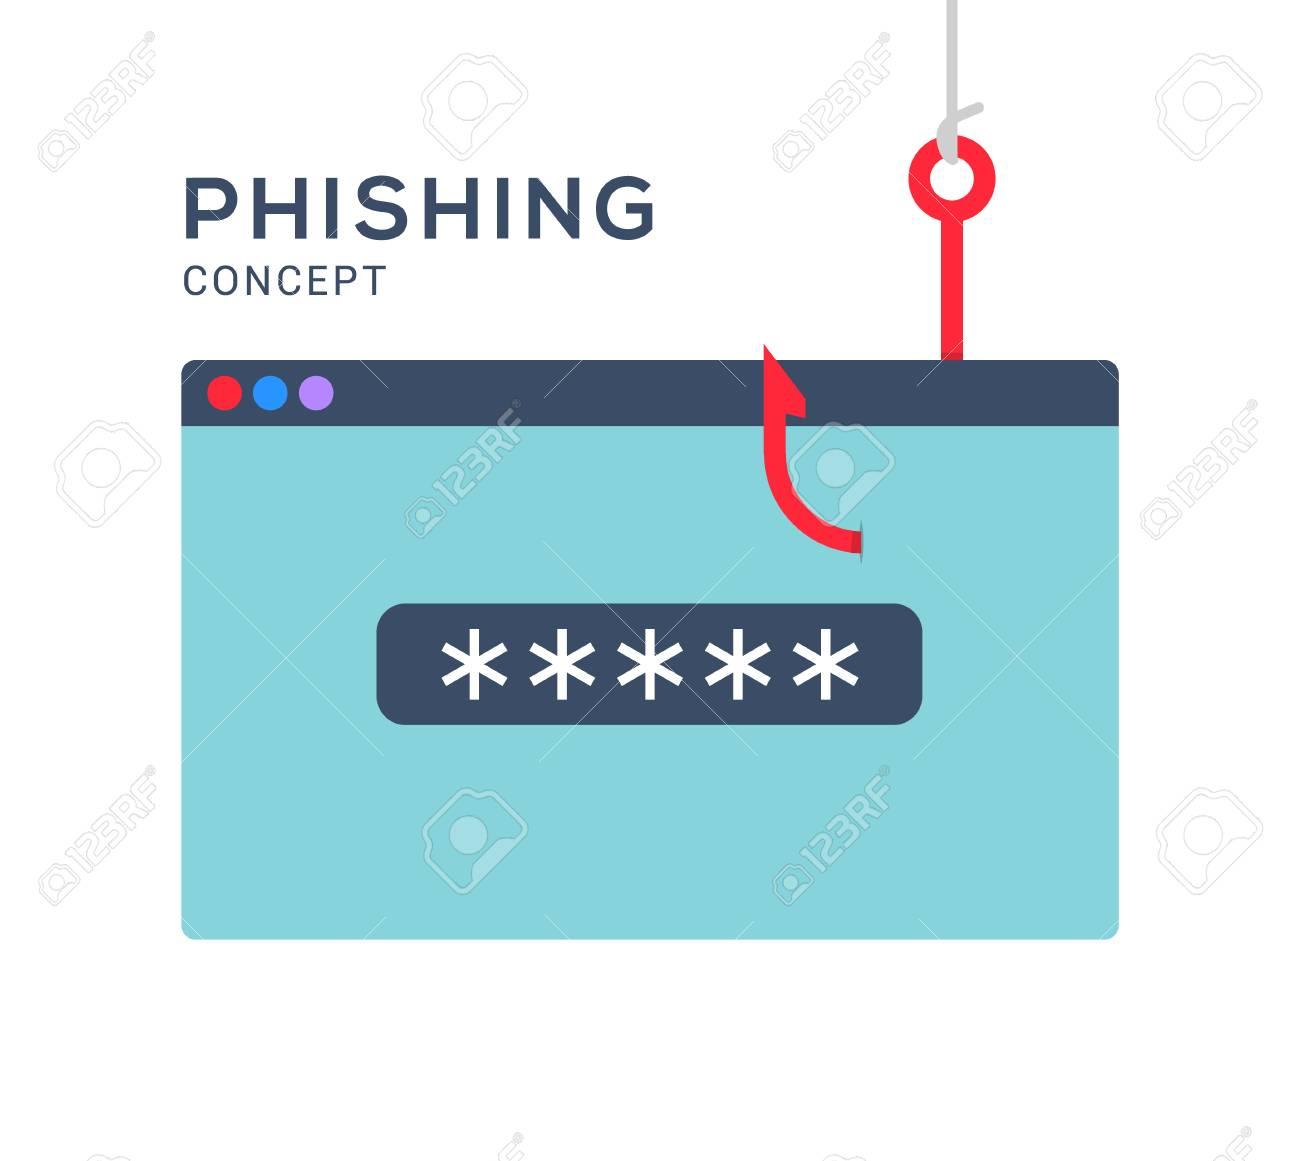 Data phishing hacking online  Scam envelope concept  Computer